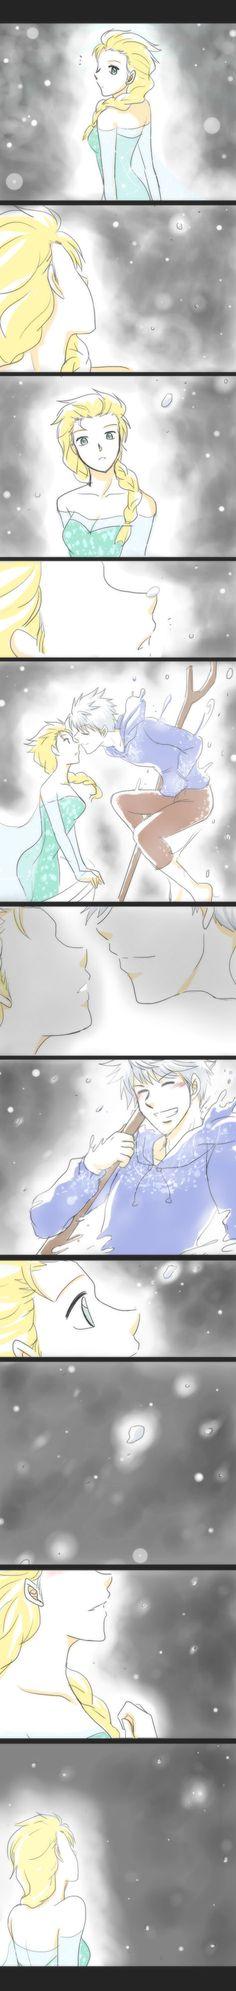 Little Snow by Tc-Chan on deviantART